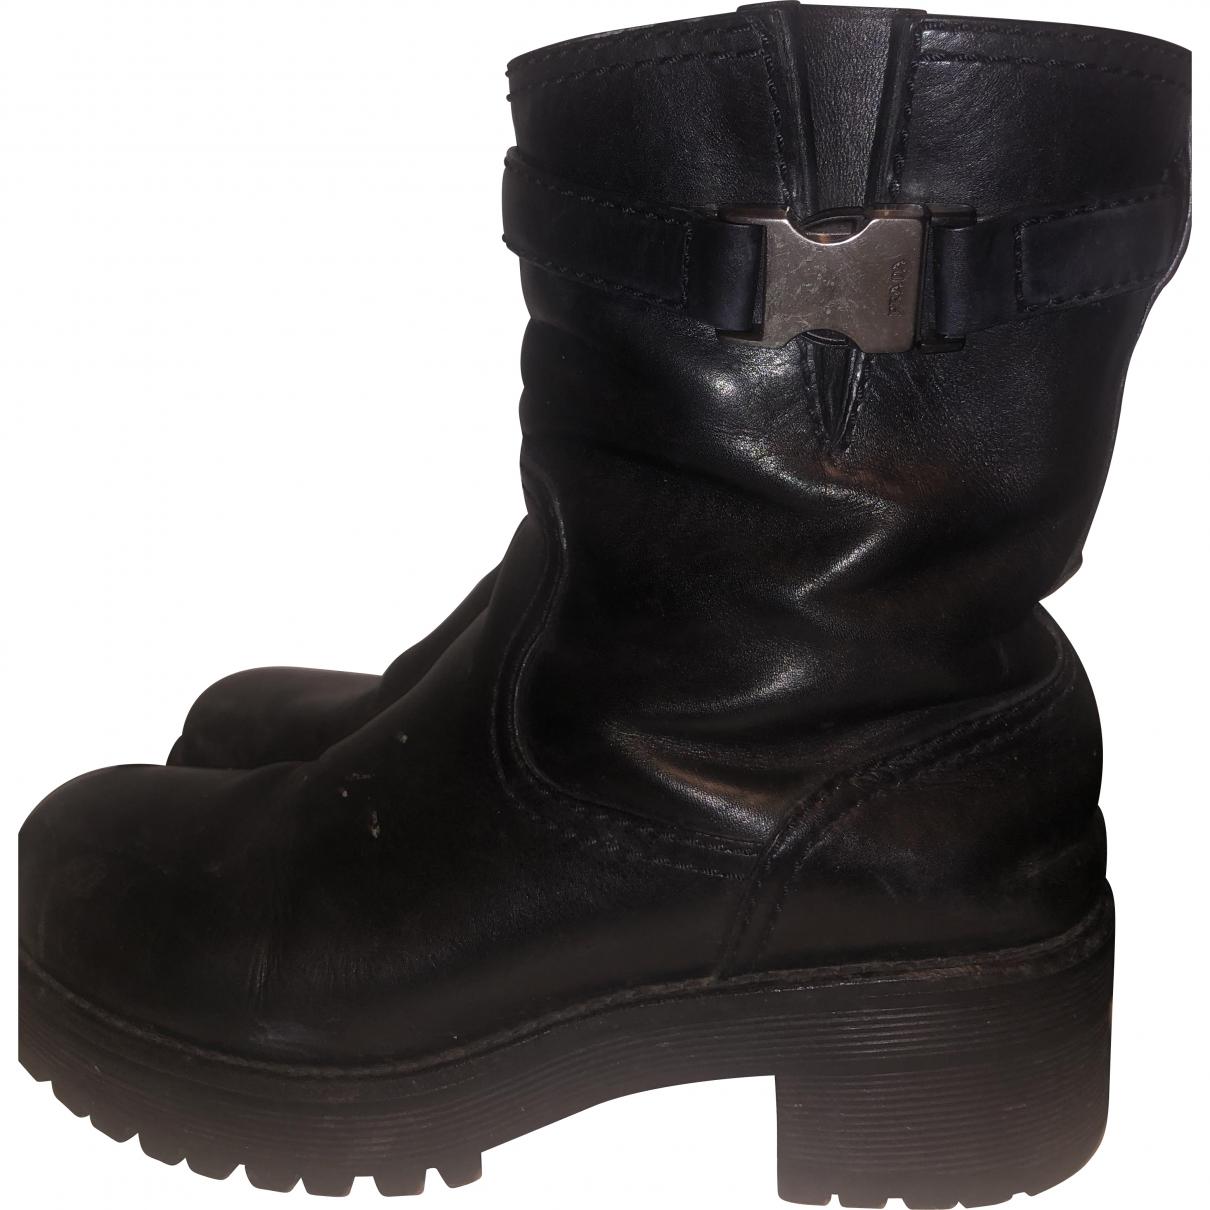 Prada \N Black Leather Boots for Women 36.5 EU